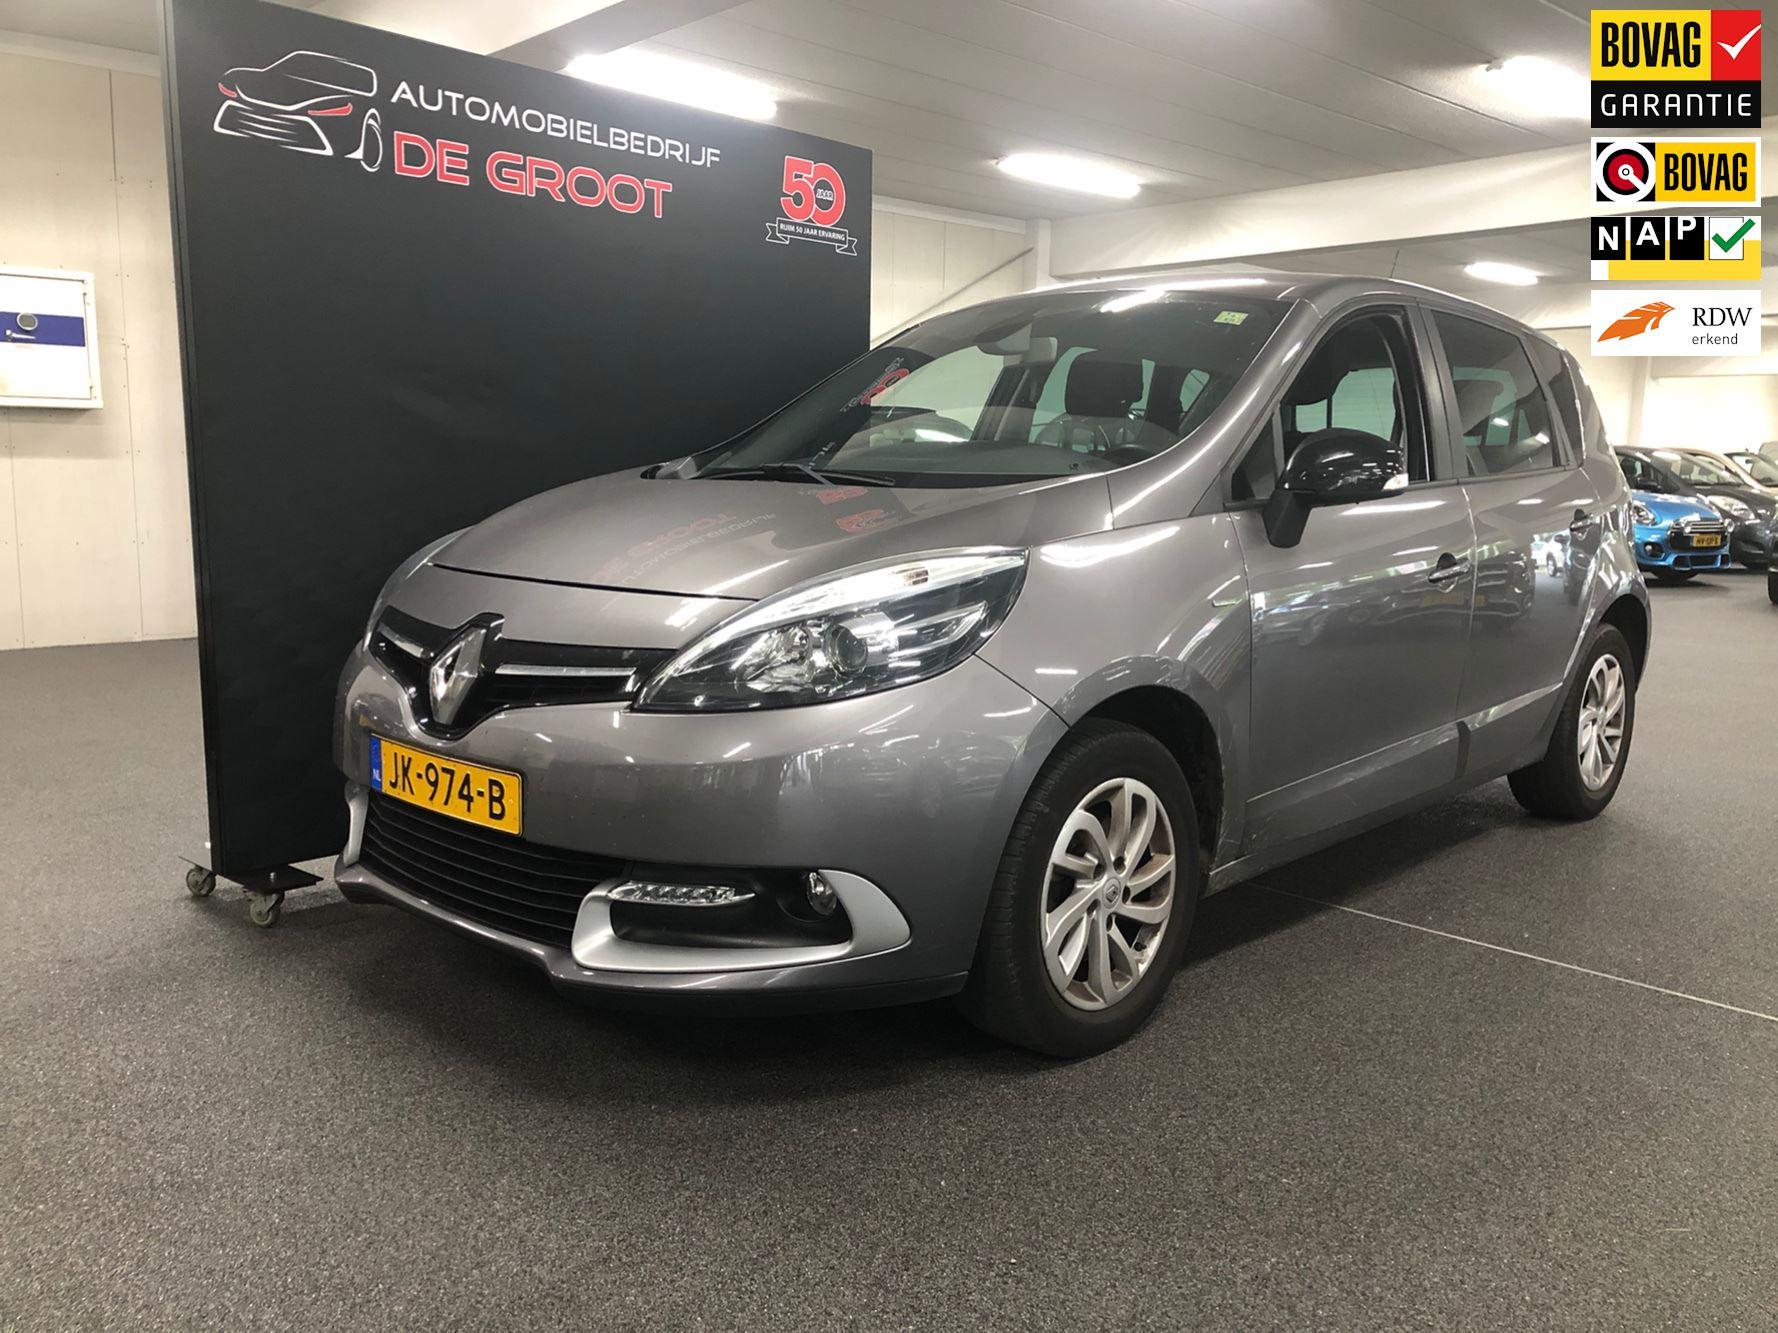 Renault Scénic occasion - Automobielbedrijf de Groot